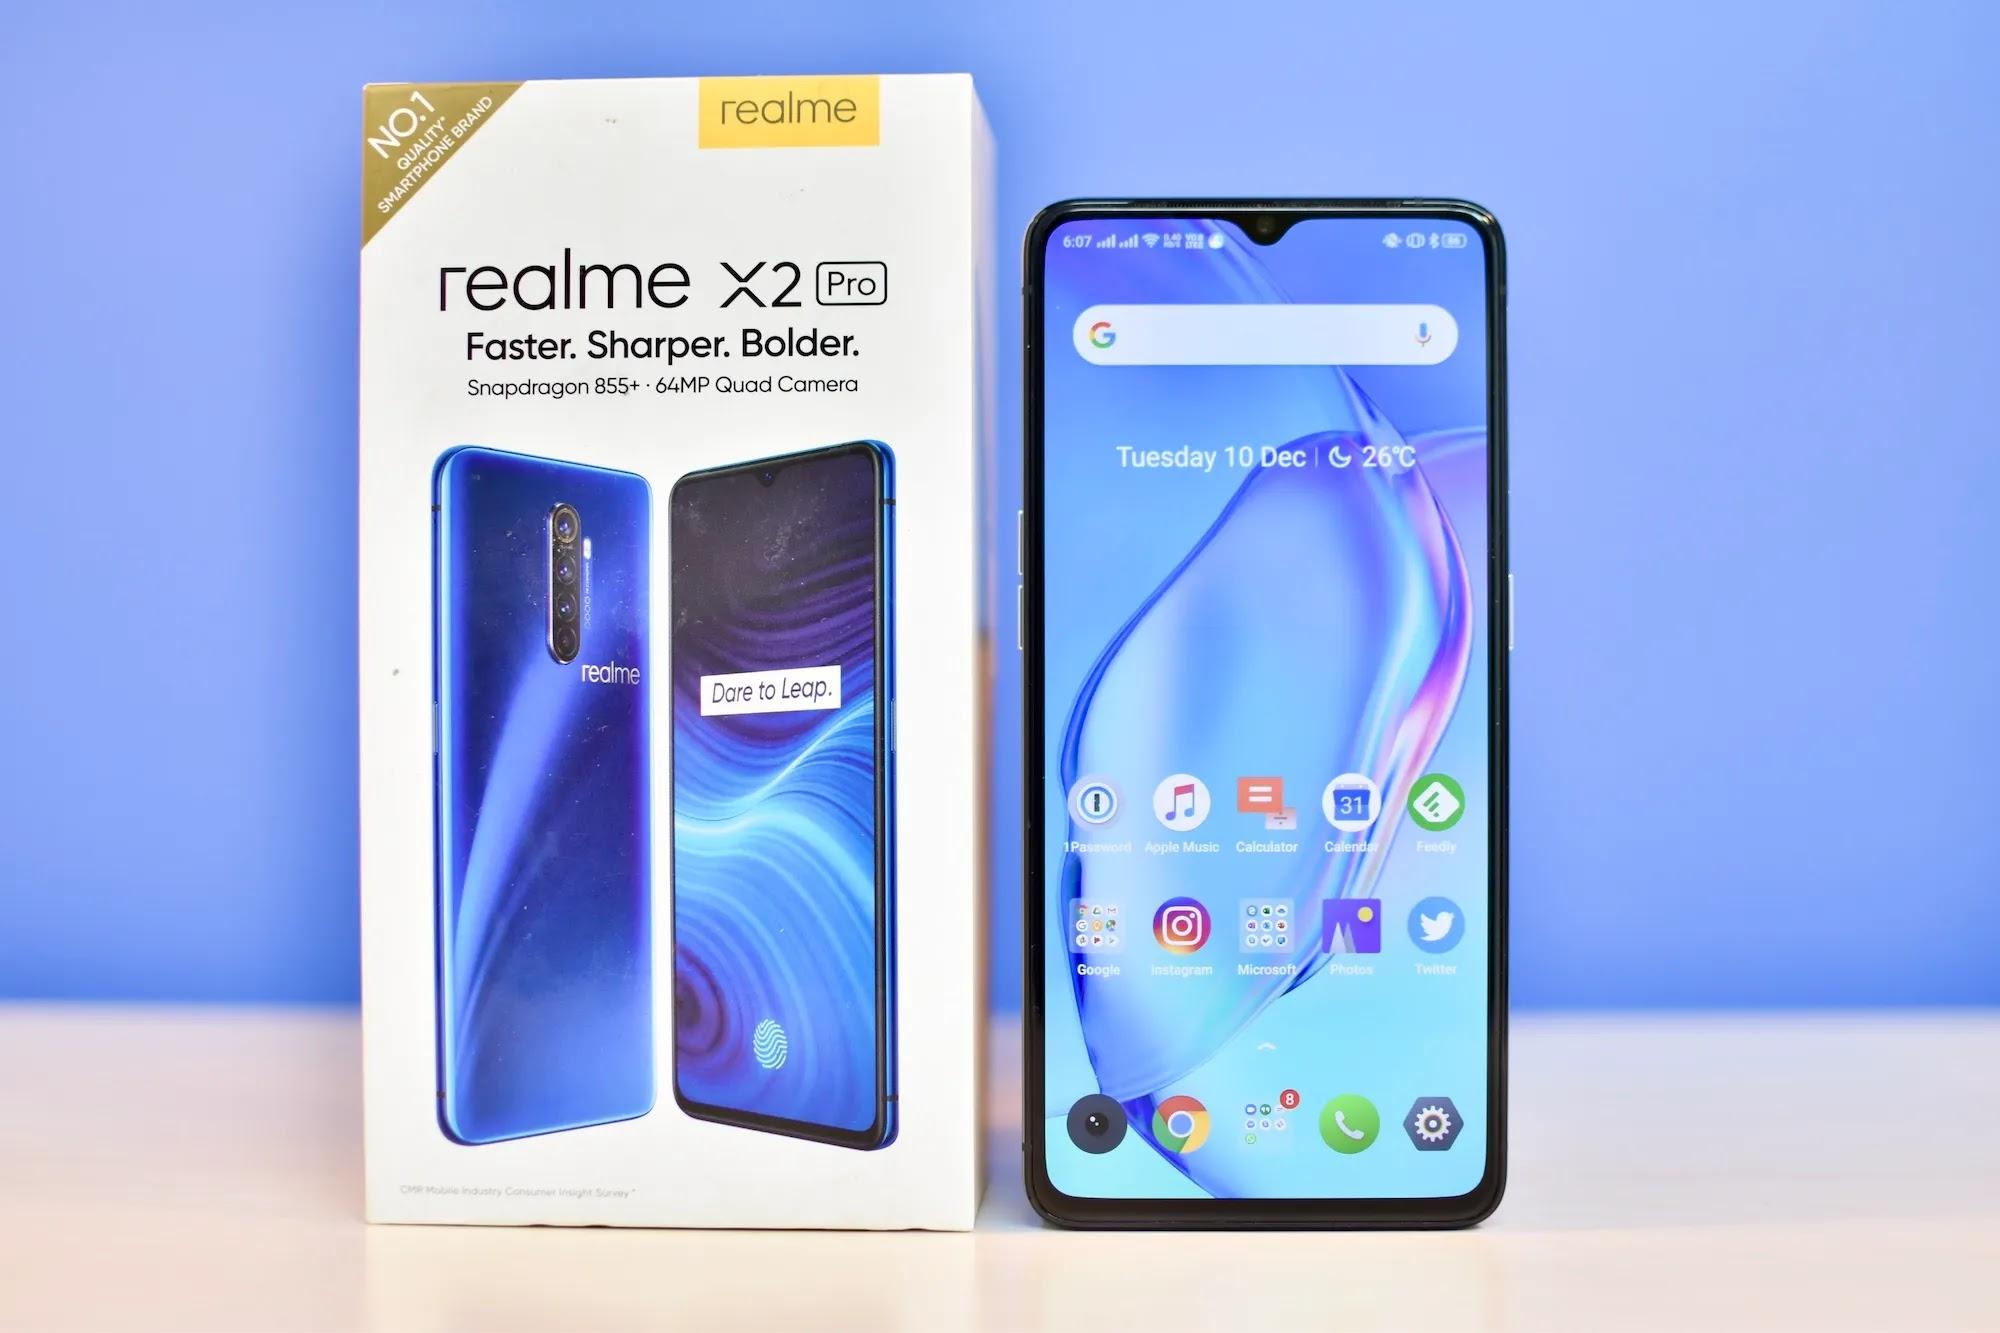 Harga Realme X2 PRO Di Tahun 2021 Terbaru